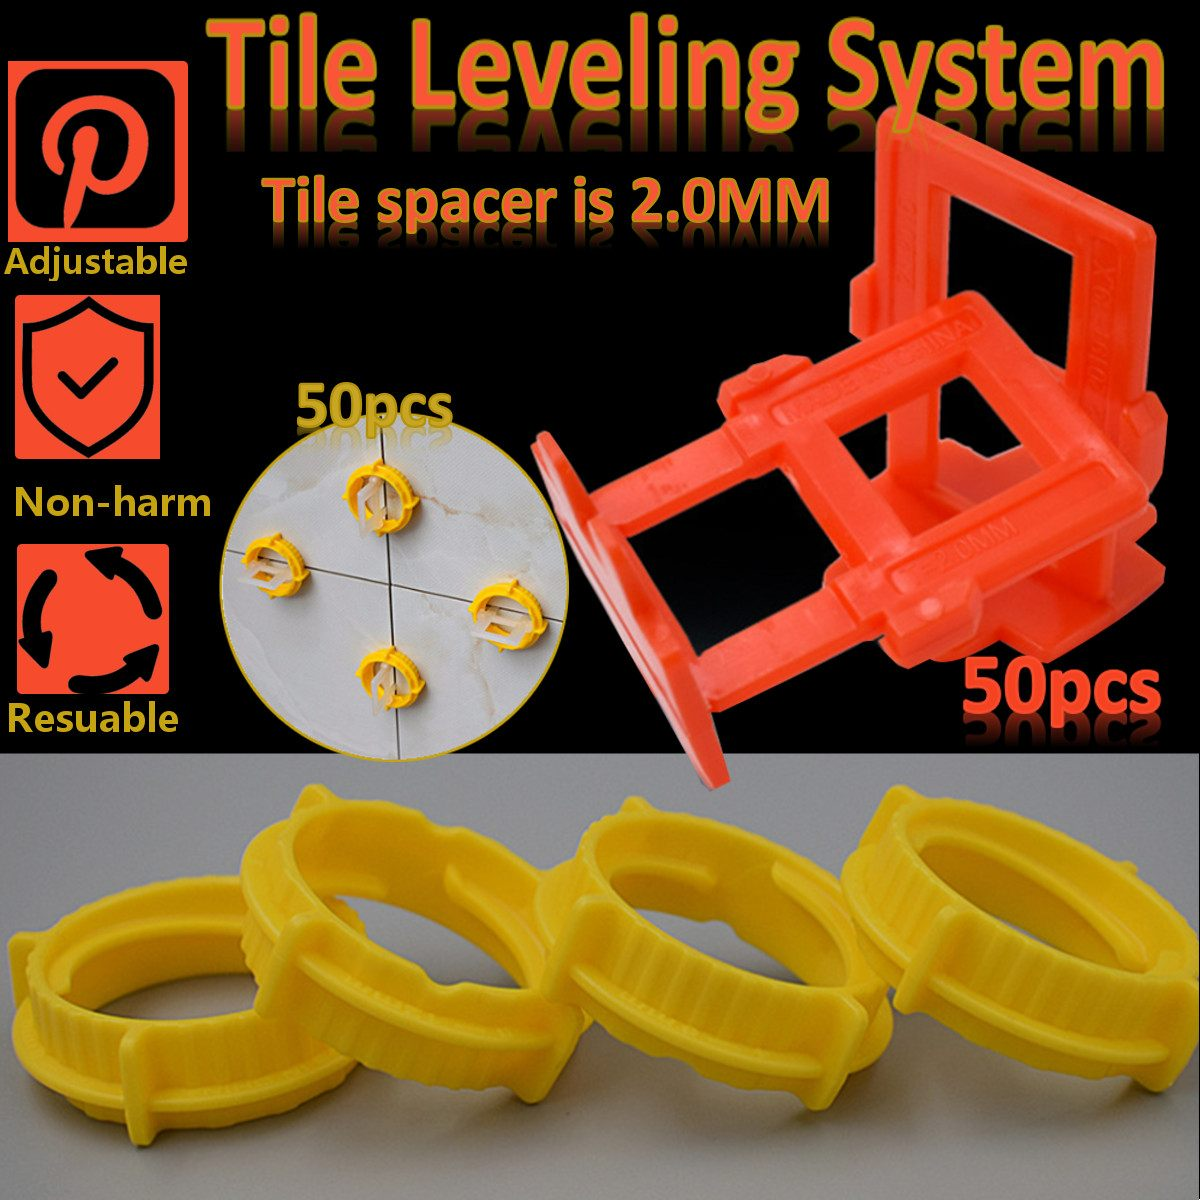 100pcs Plastic Ceramic Tile Leveling System 50 Clips+50 Wedges Tiling Flooring Tools Wedges Clips